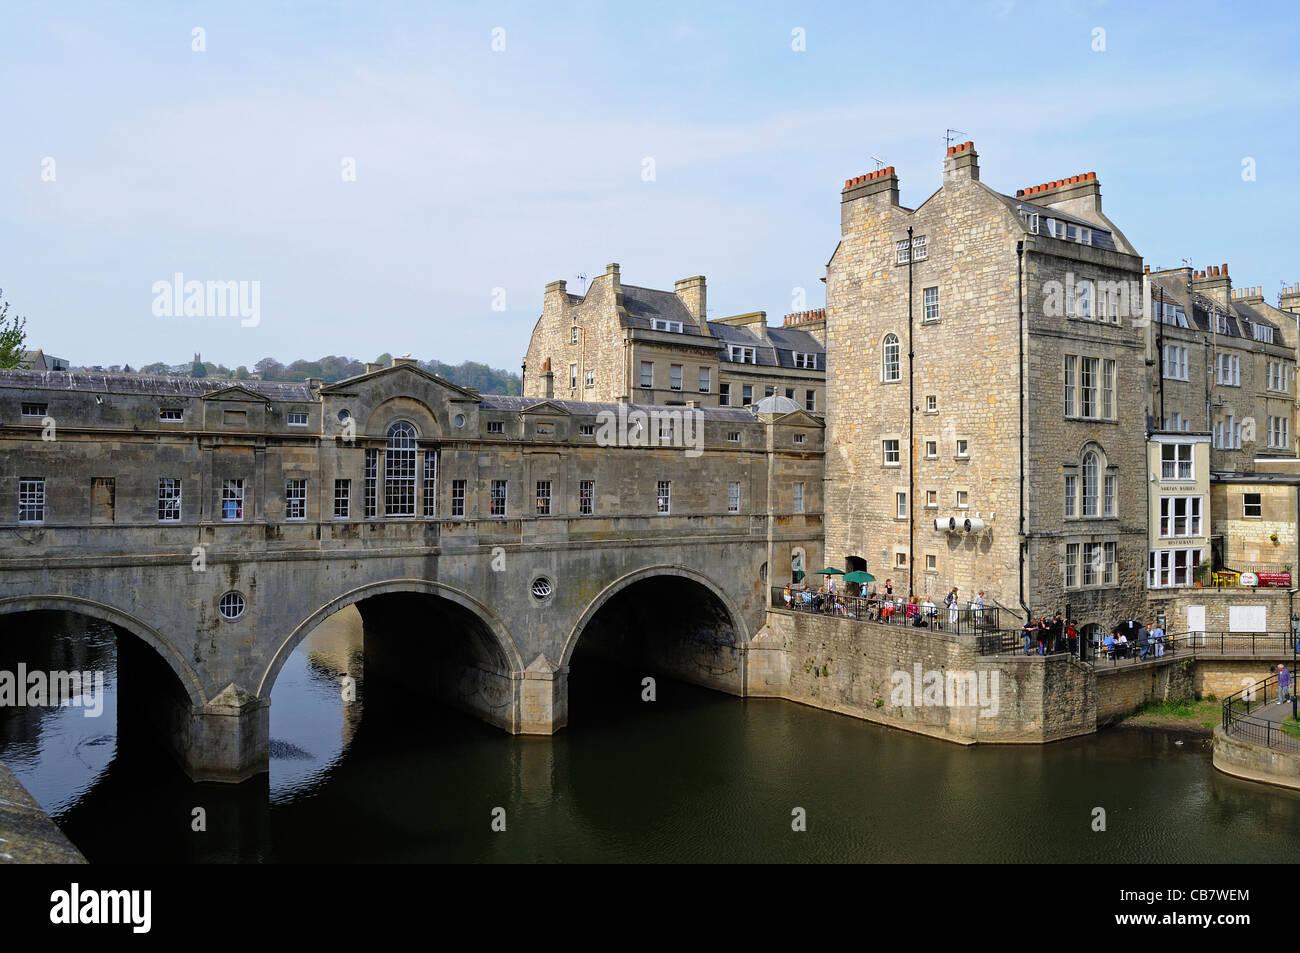 The Famous Pulteney Bridge Over River Avon In Bath England UK